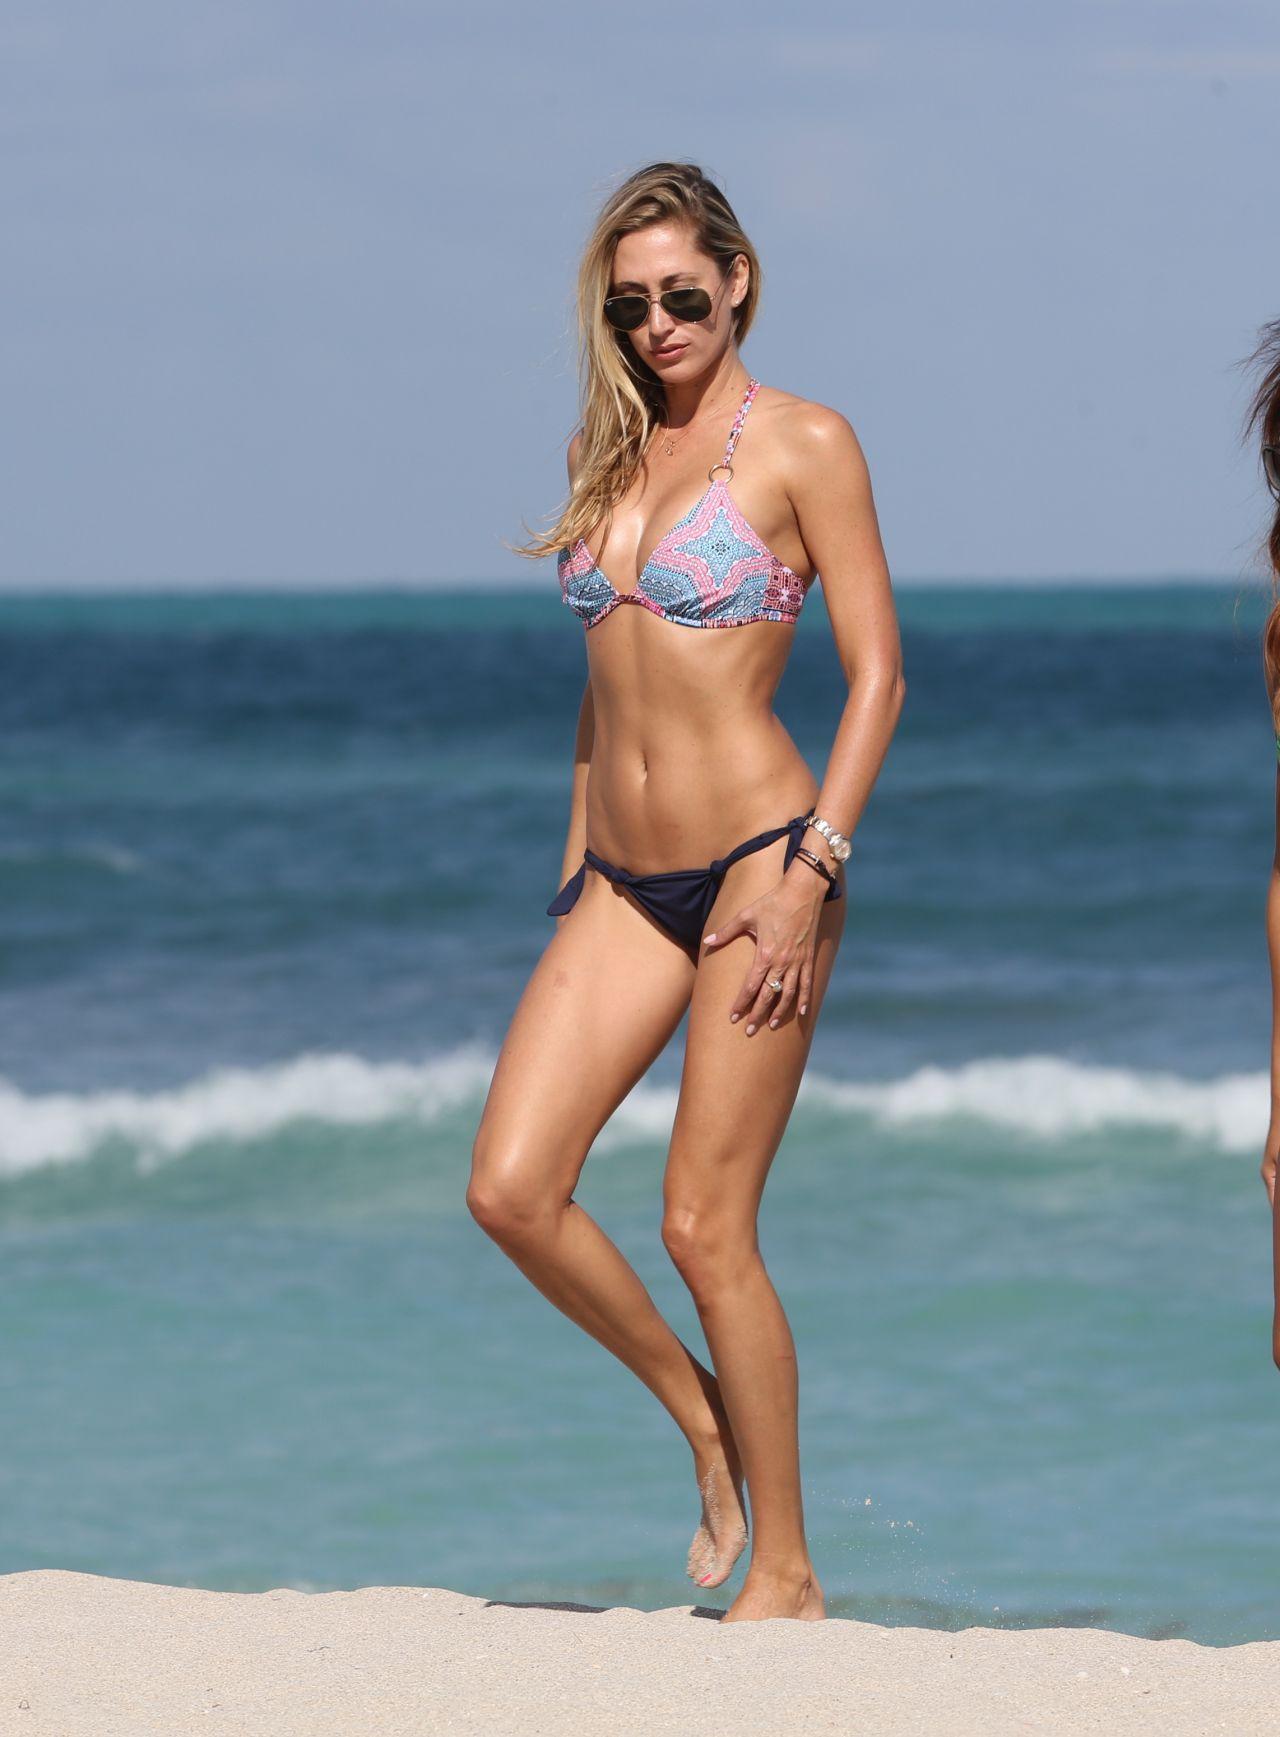 Paparazzi Lauren Stoner nudes (59 photo), Pussy, Hot, Boobs, legs 2020